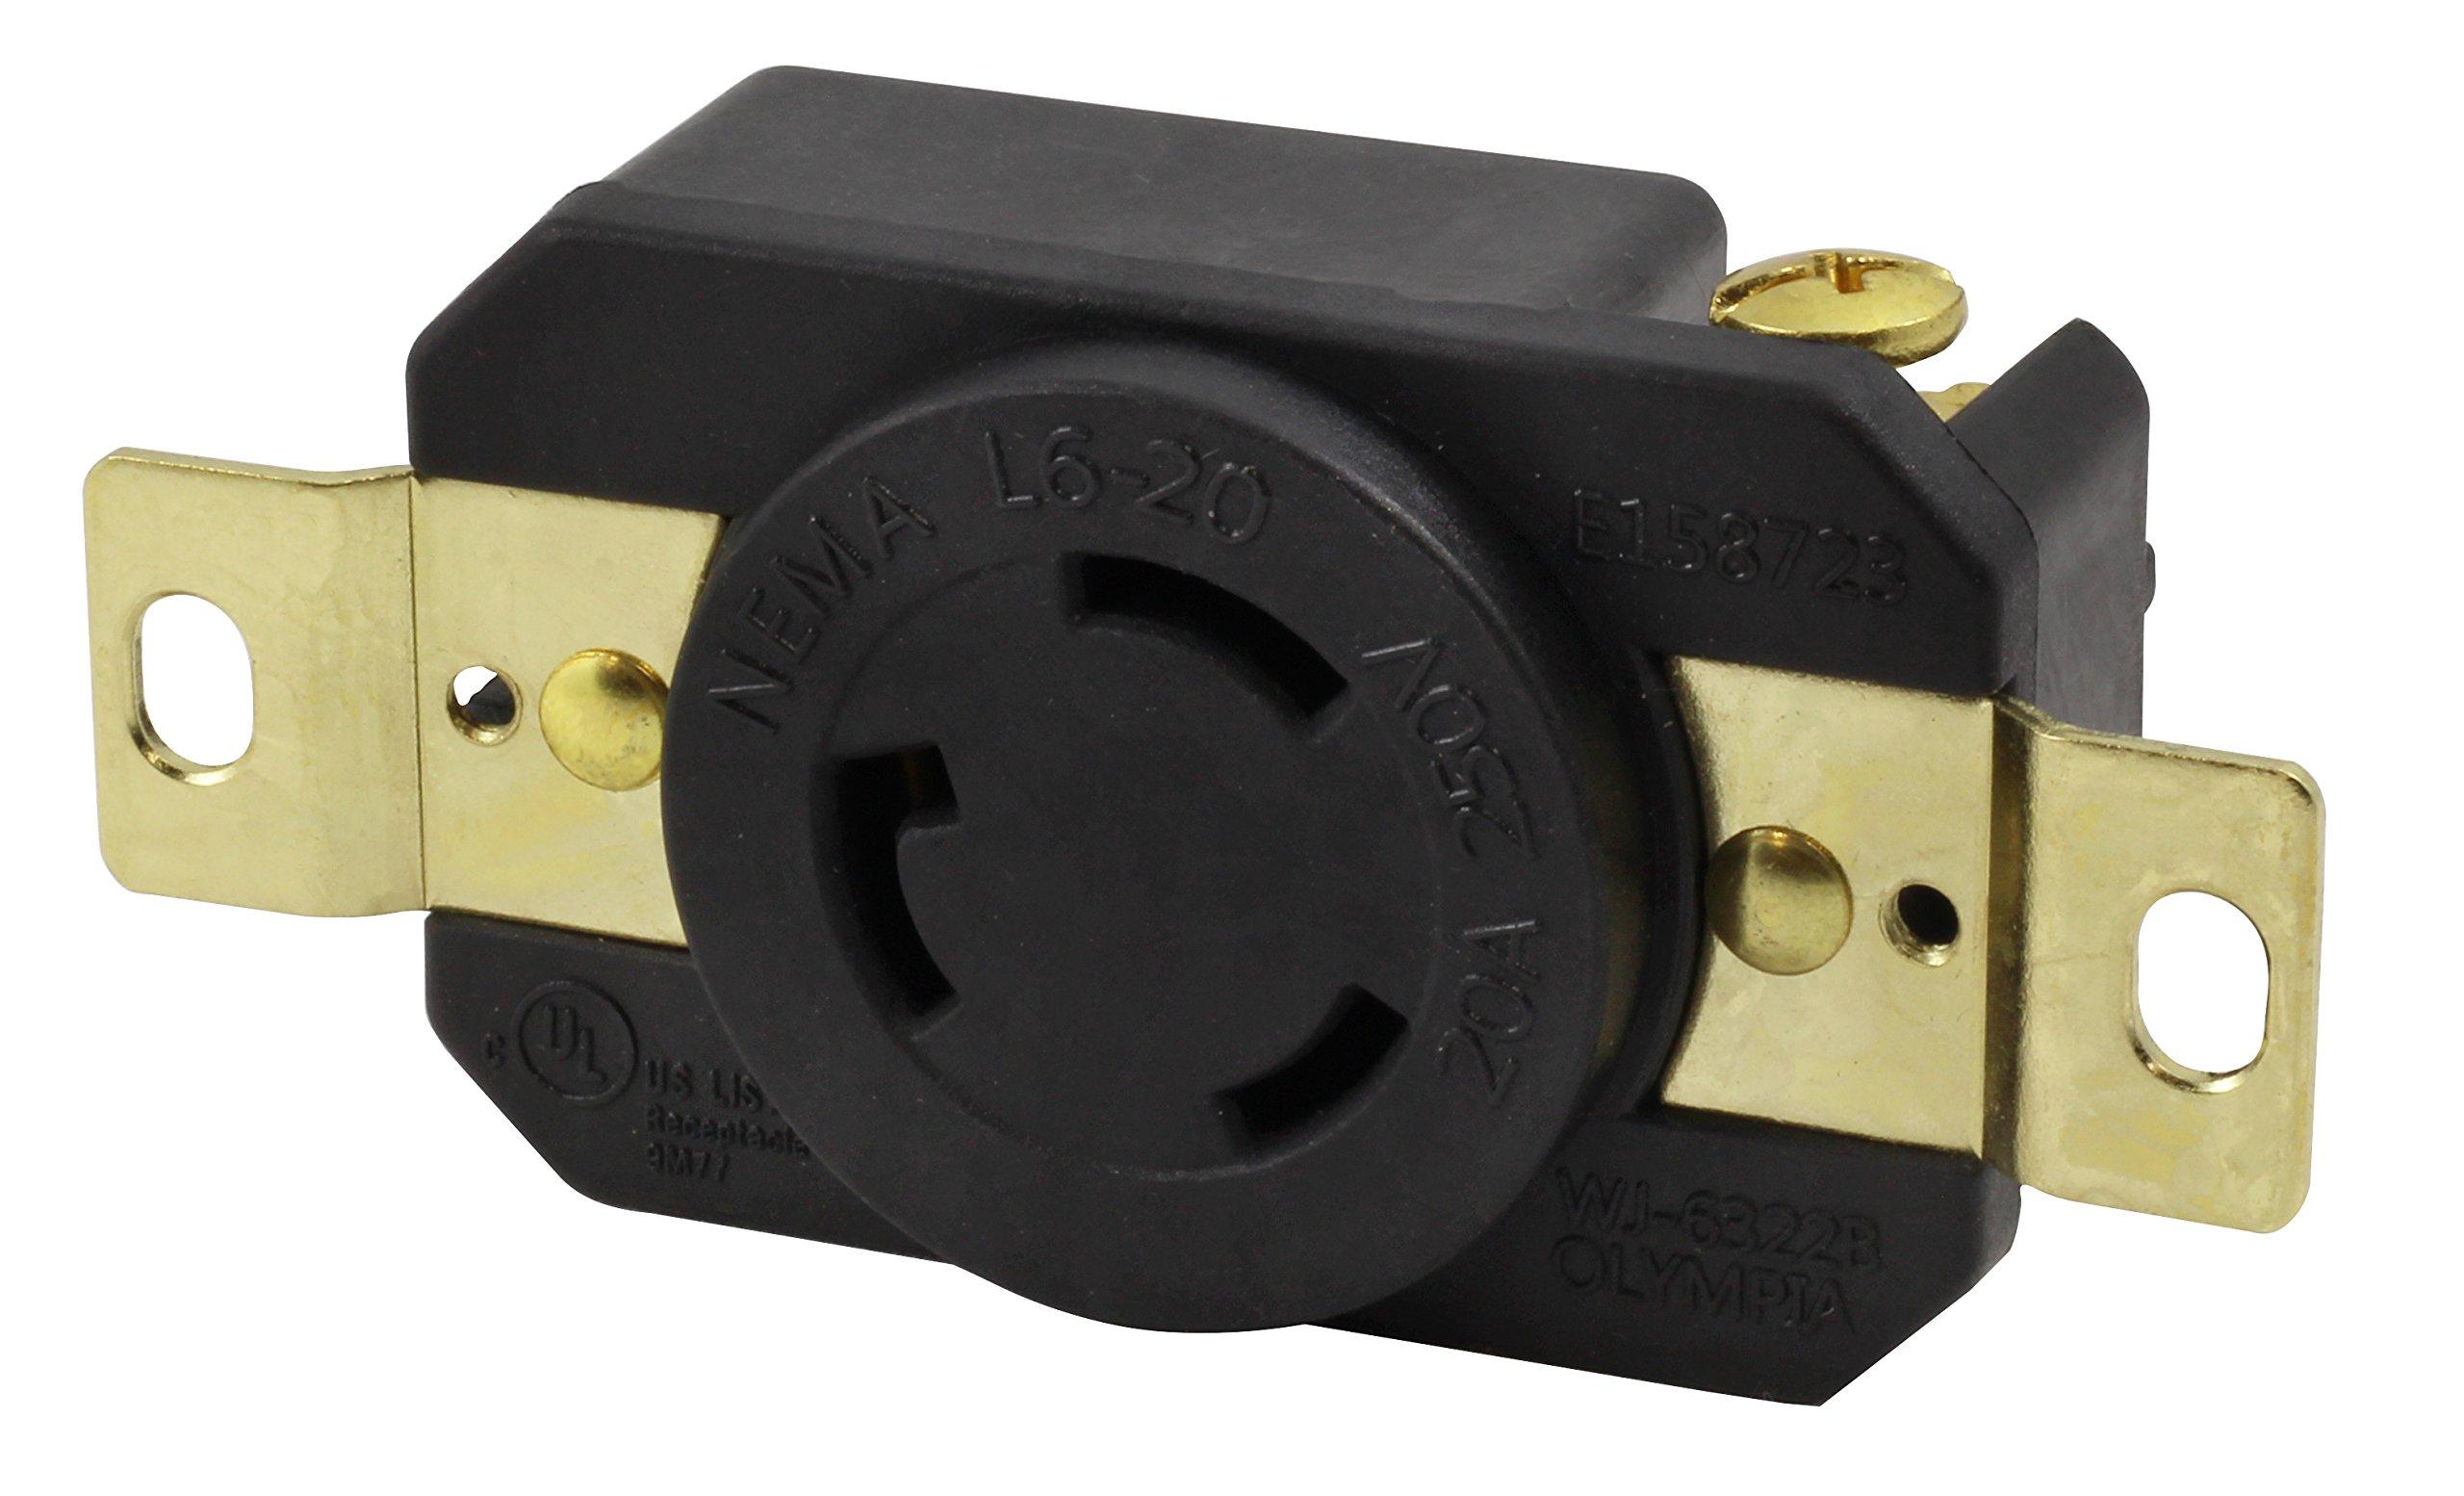 AC WORKS [FML620R] 20-Amp, 250-Volt, NEMA L6-20R Flush Mounting Locking Industrial Grade Receptacle